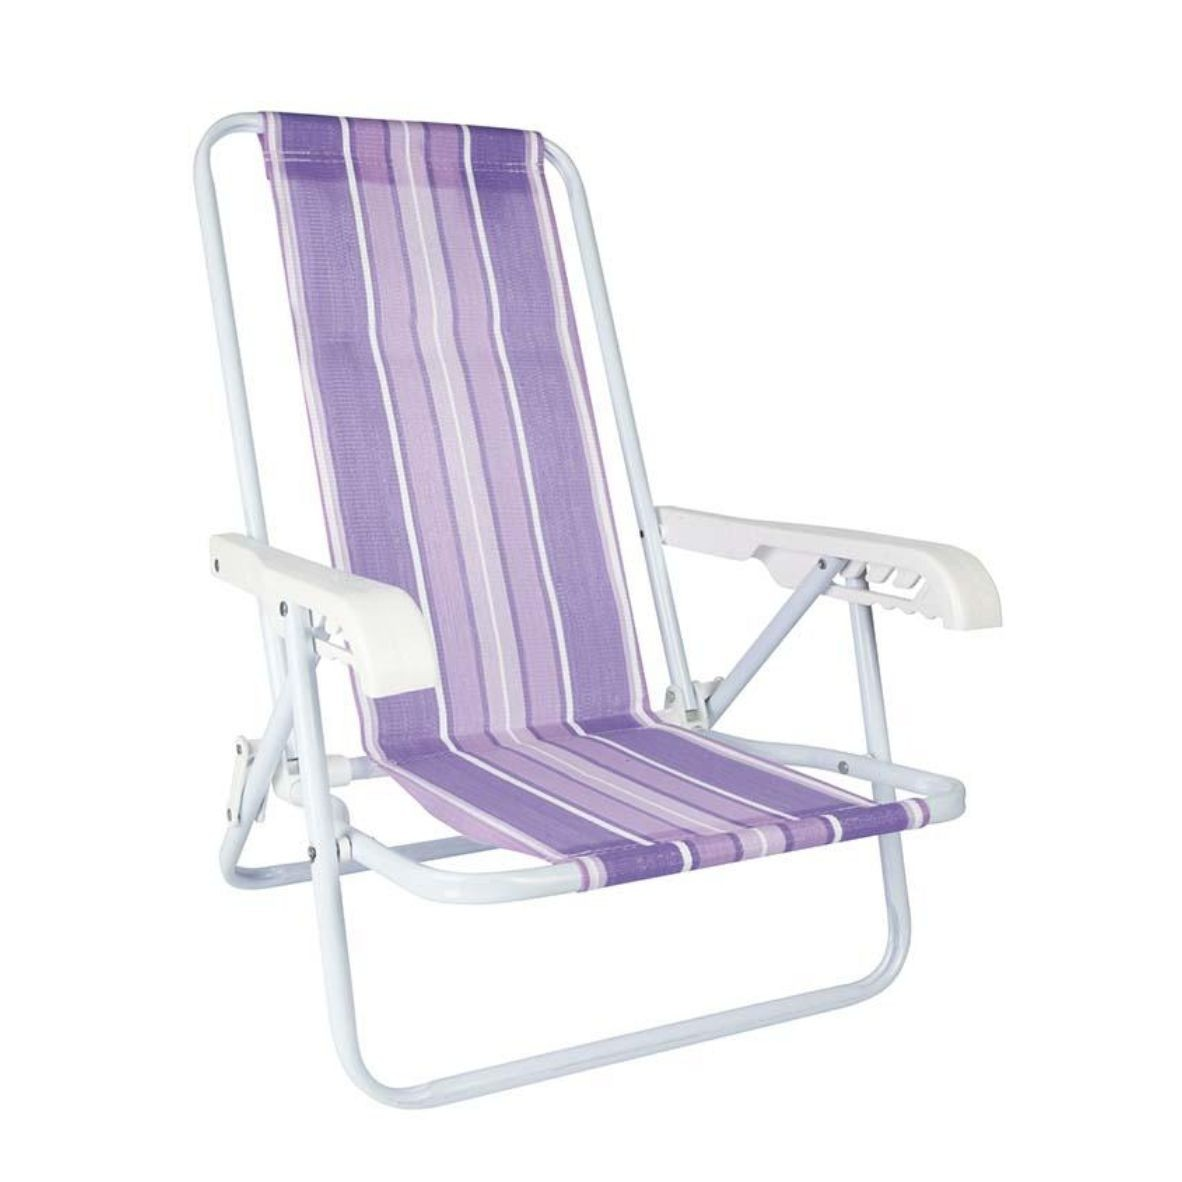 Cadeira Praia Infantil 4 Posições Lilás